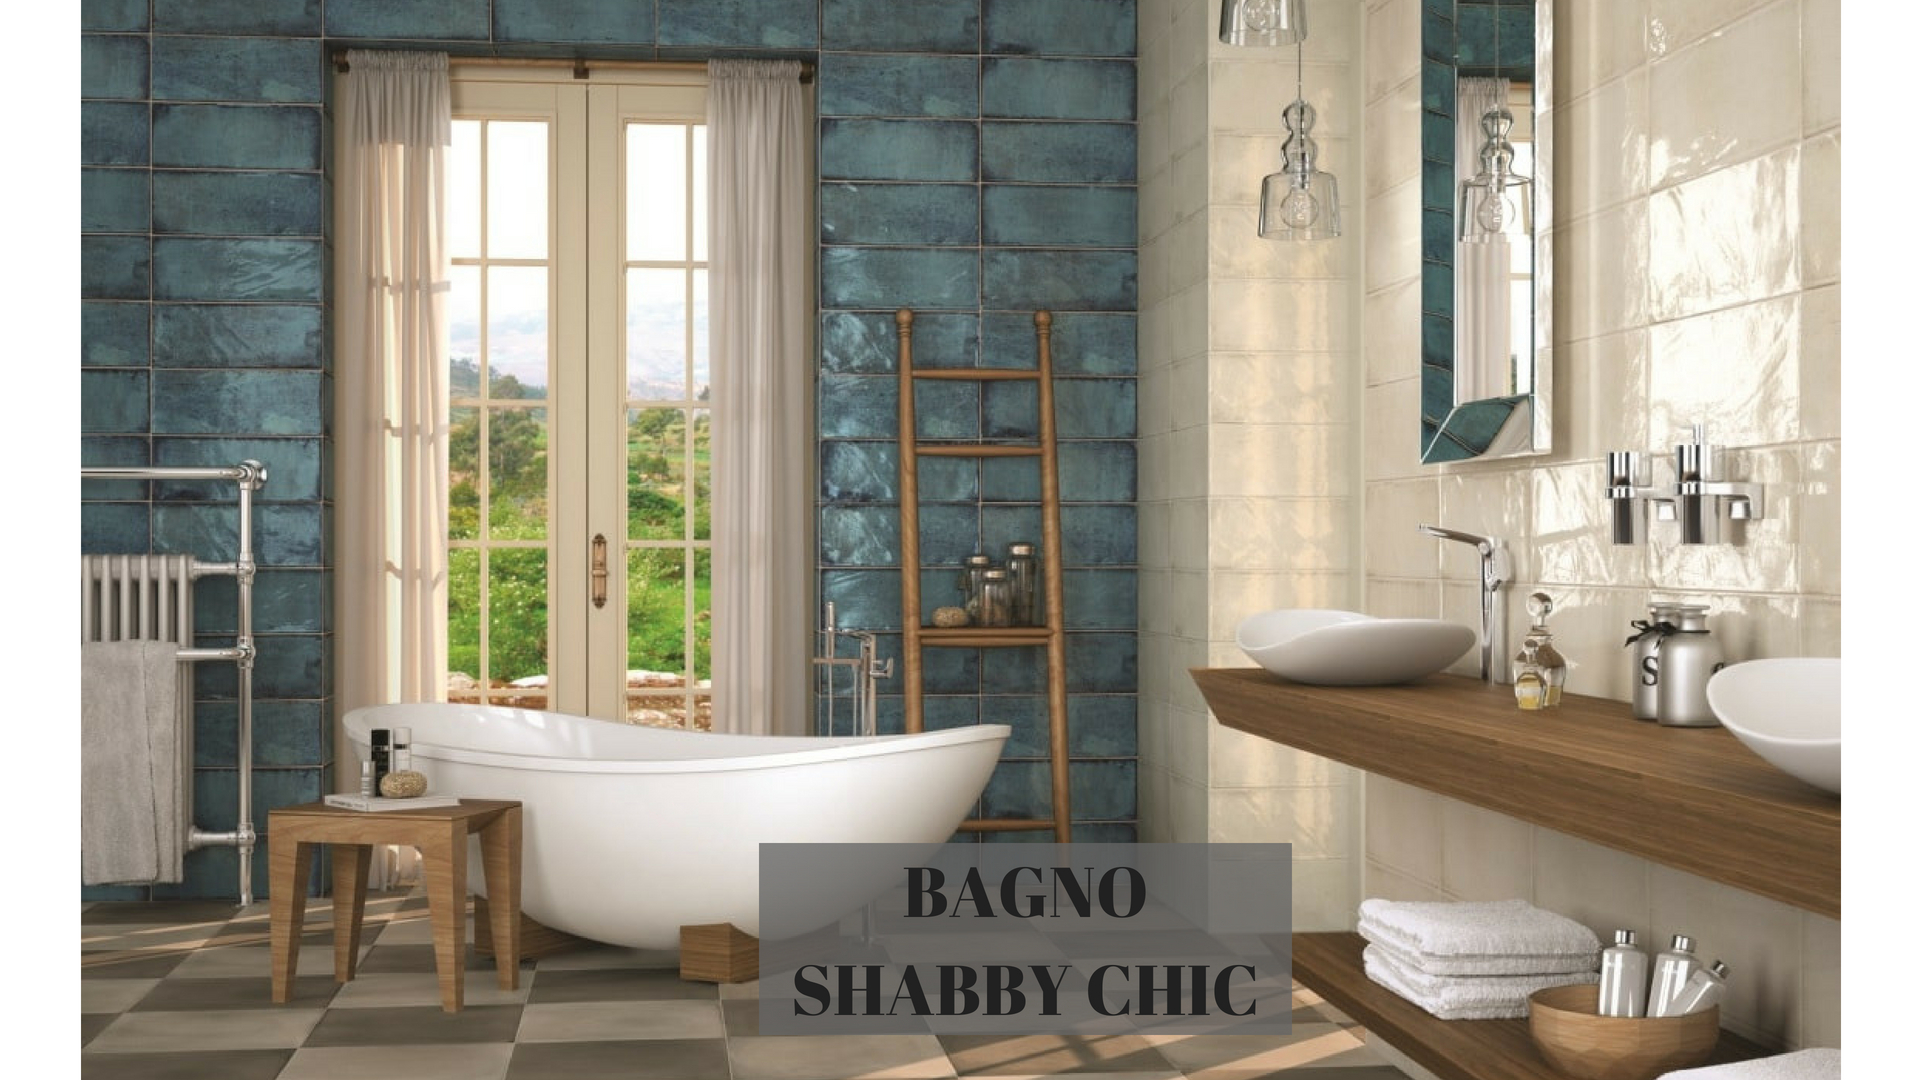 Bagno shabby chic elegantemente vintage sabia design center - Bagno shabby chic moderno ...